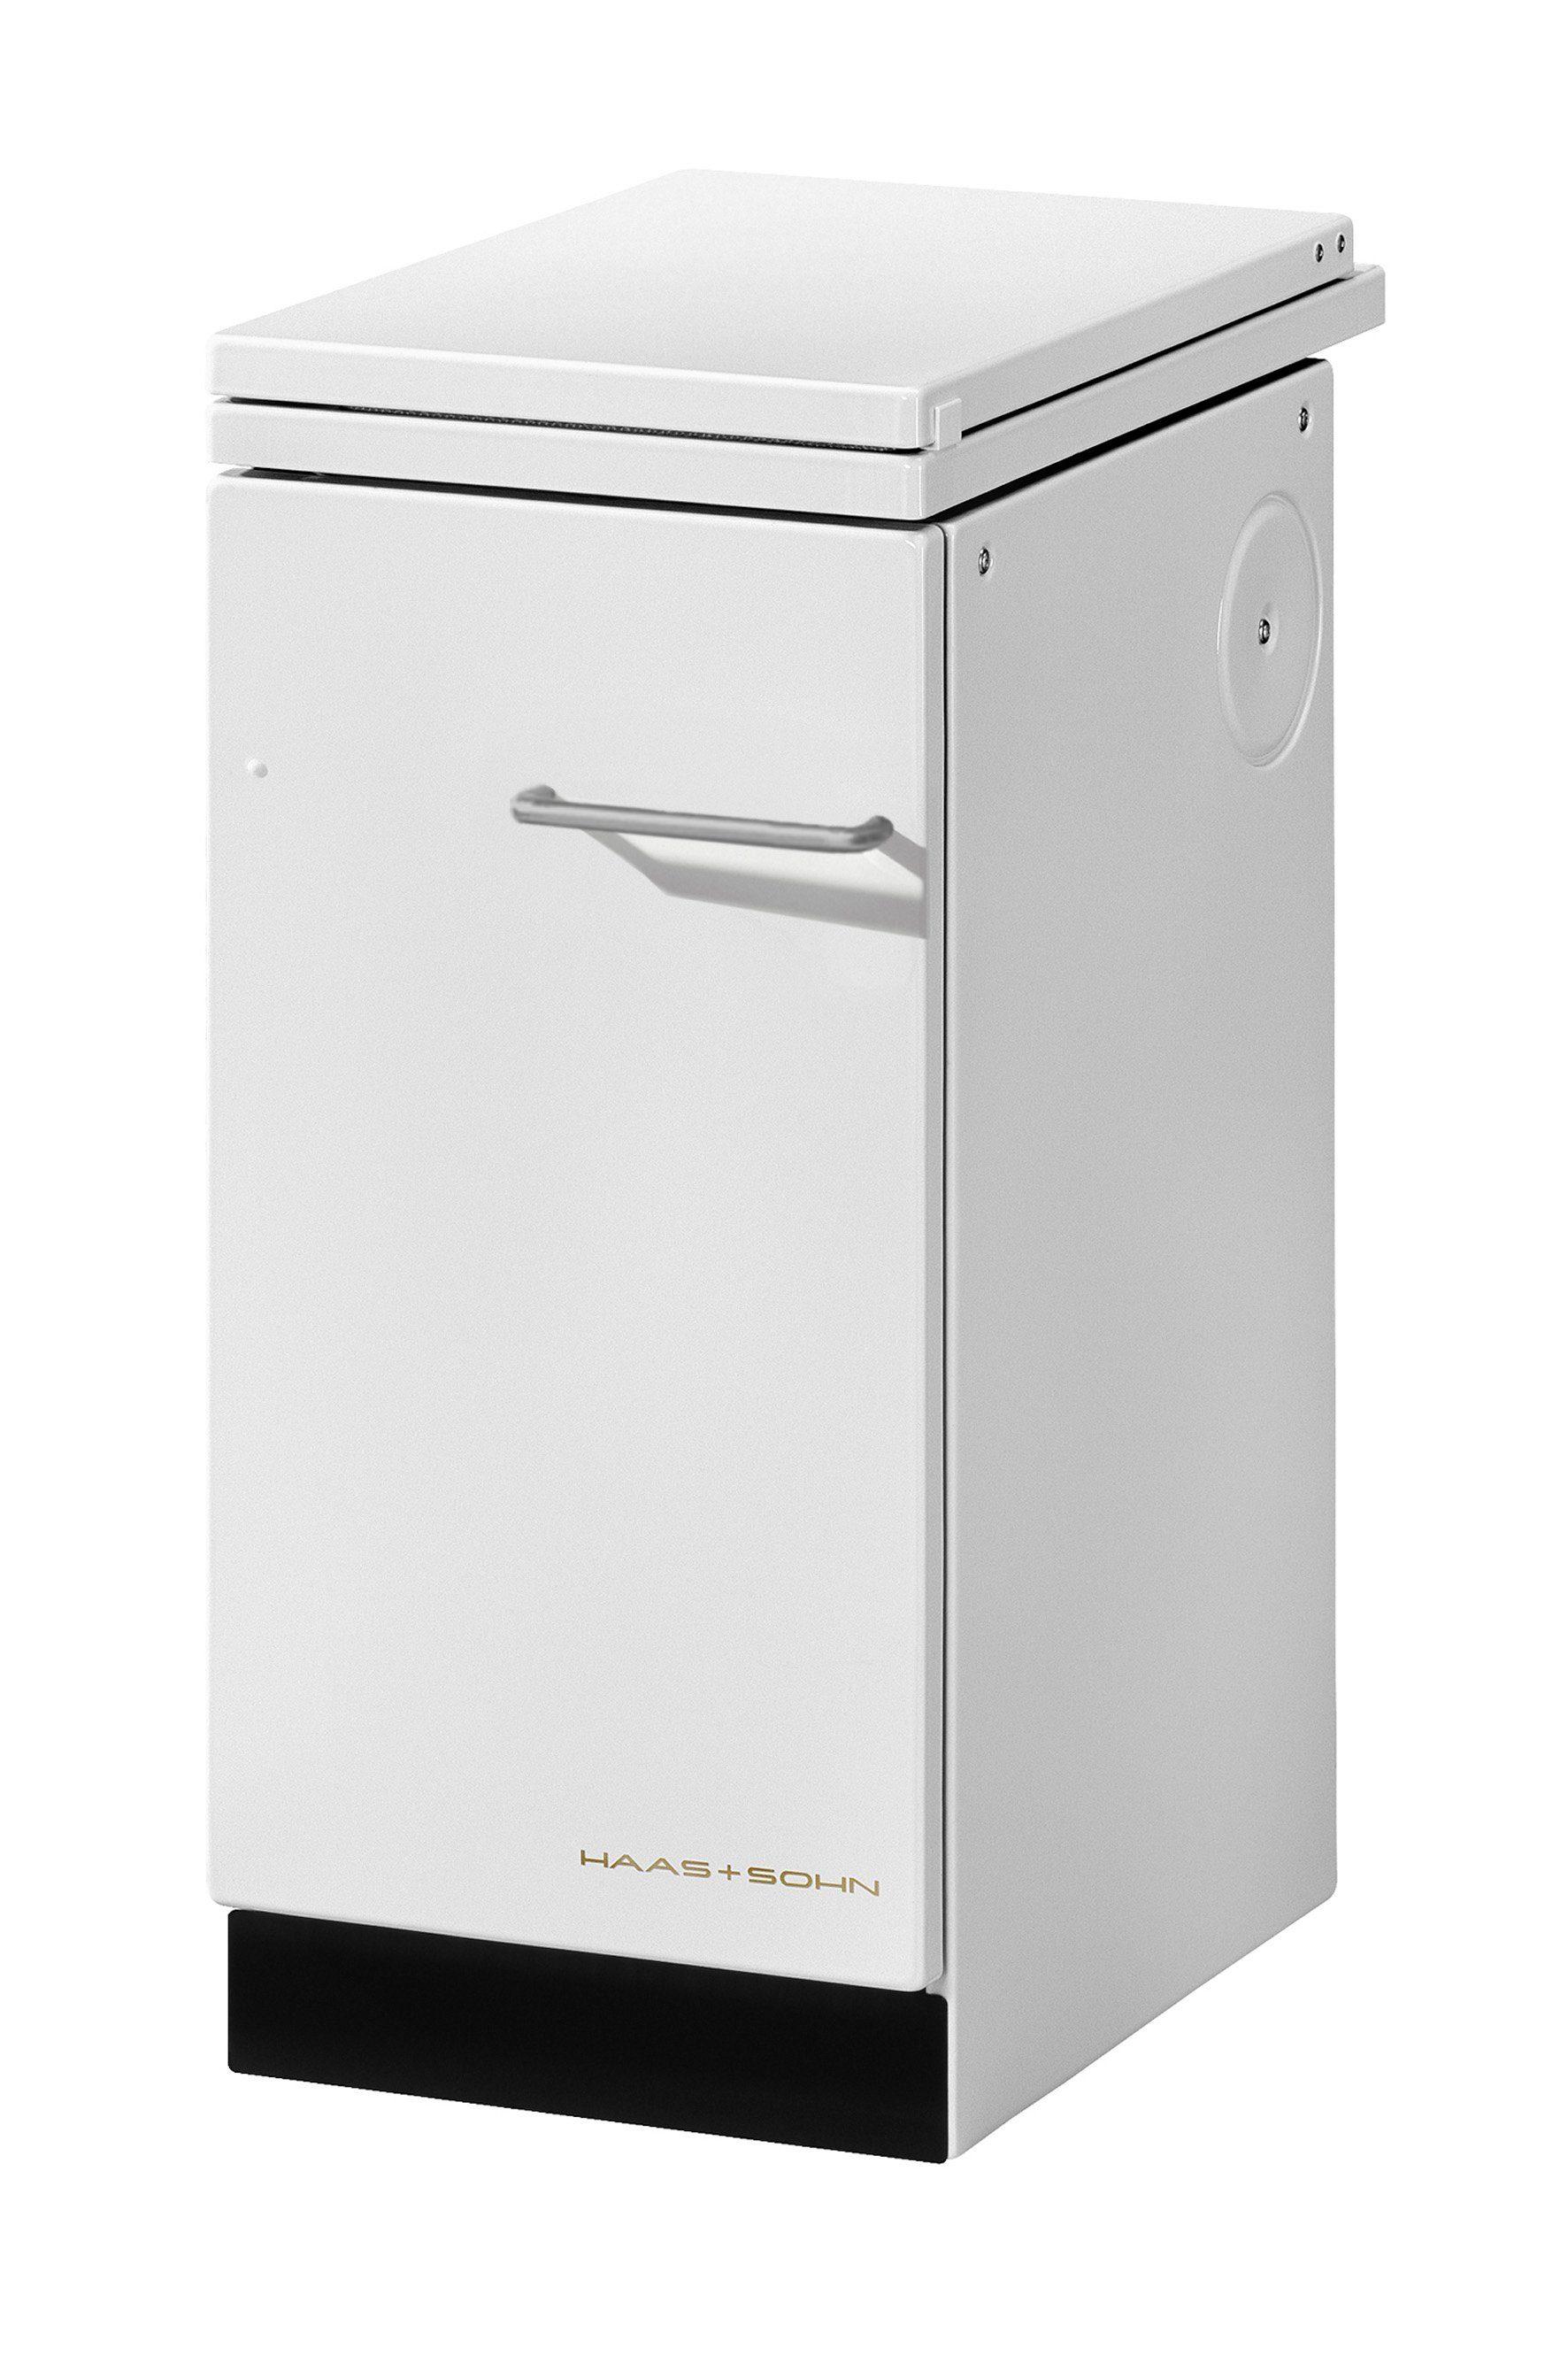 Festbrennstoffherd »HA 40.5 A«, Stahl weiß, 6 kW, Dauerbrand, Kochfeld